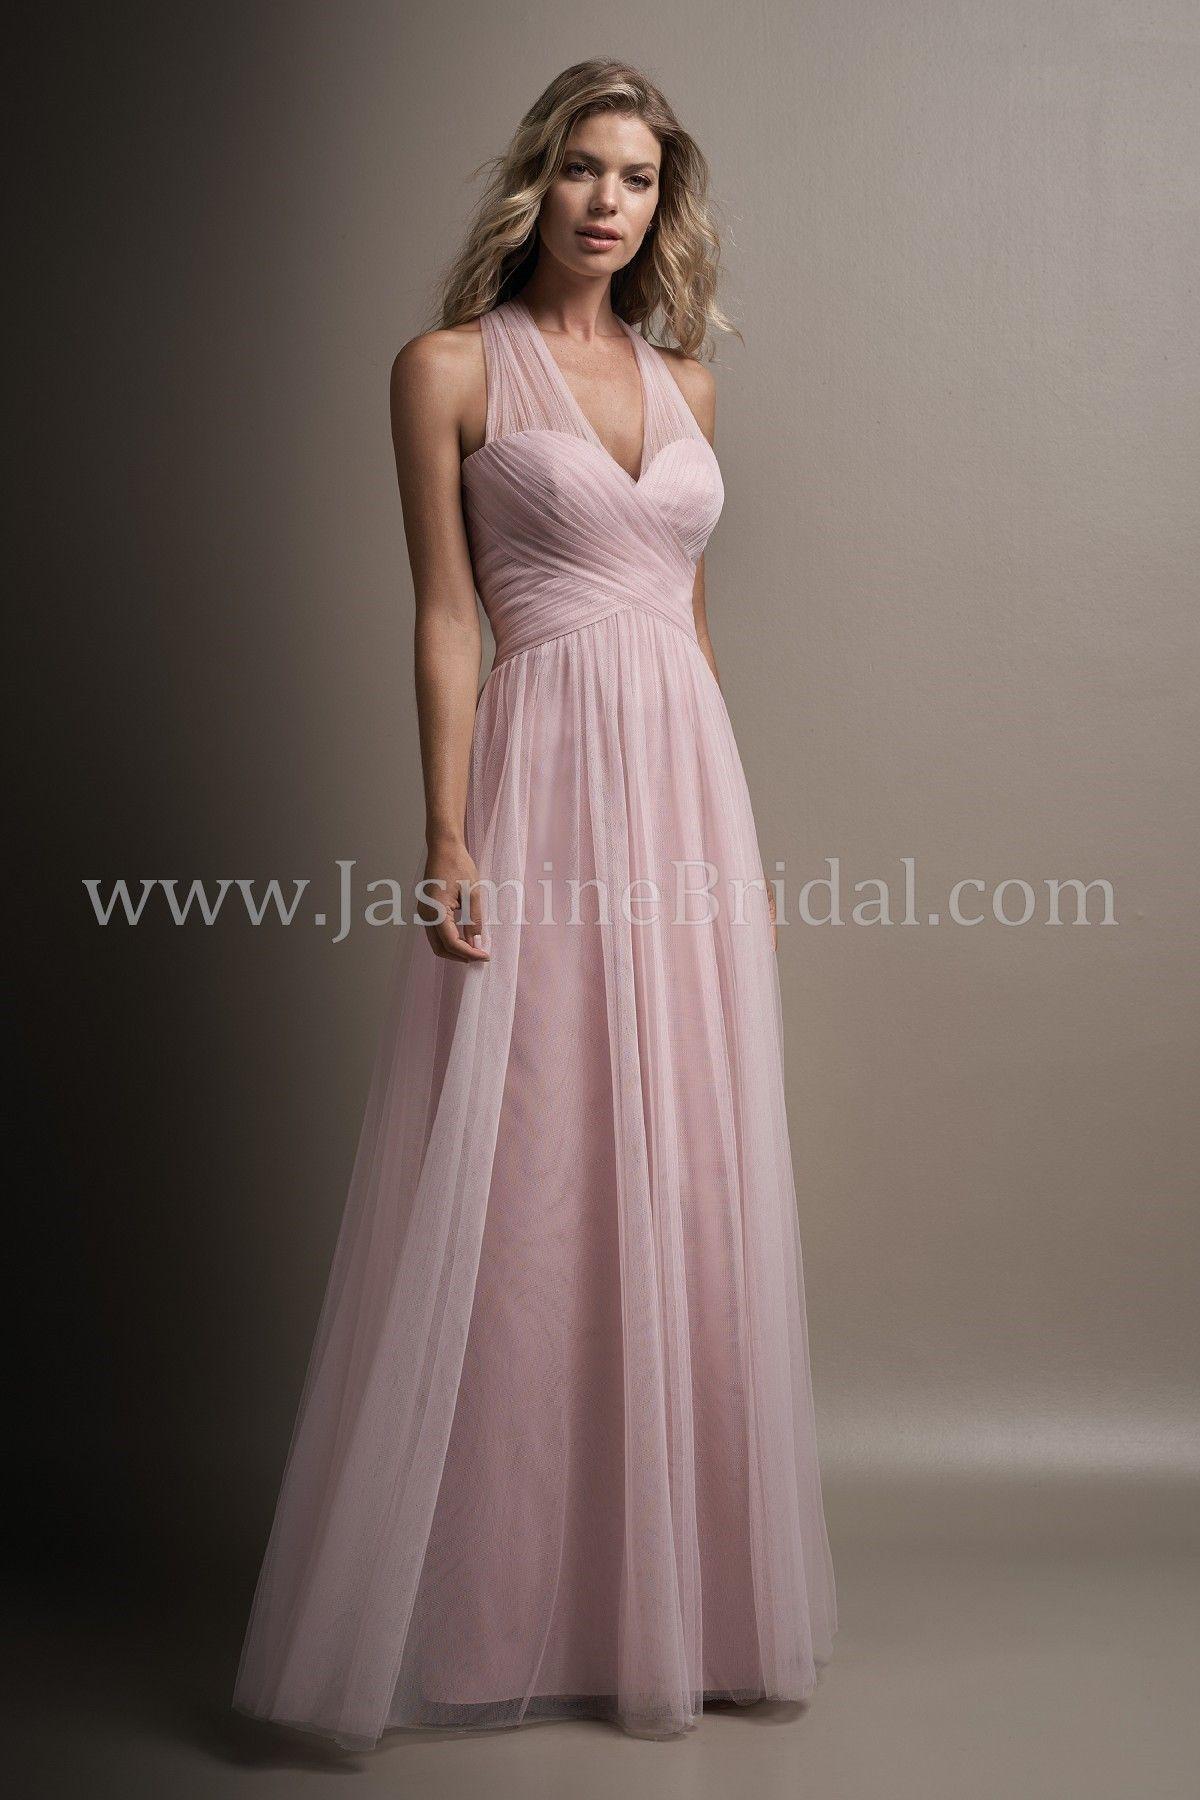 Jasmine Bridal Belsoie Style L194004 In Misty Pink